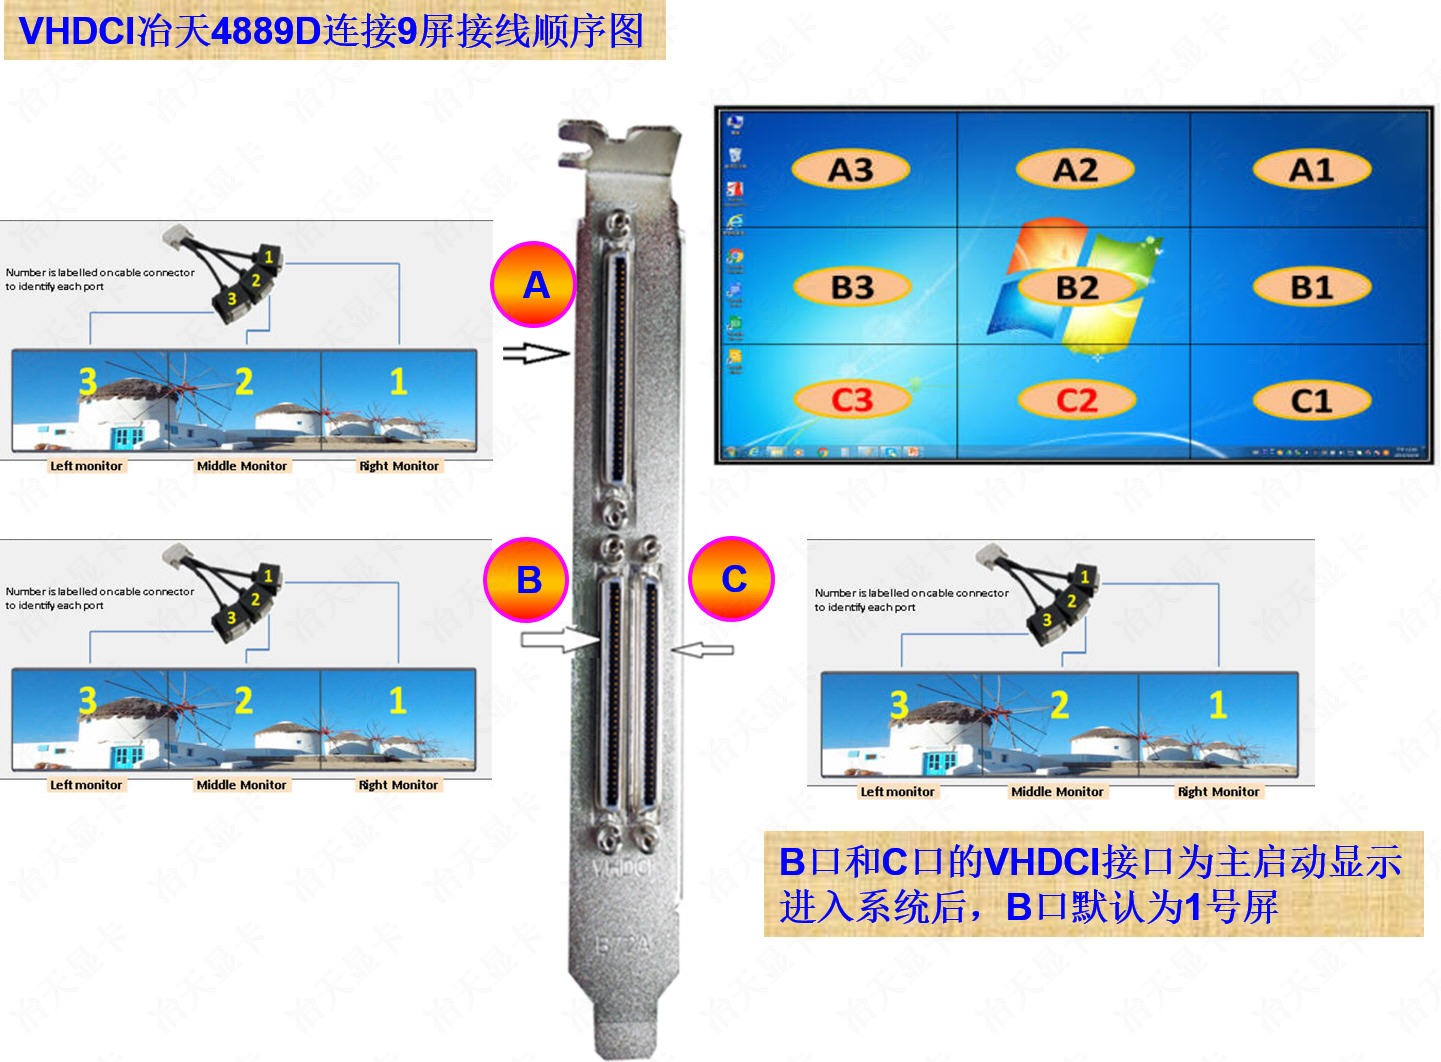 RX480 9X cable order 9屏拼接联想顺序图